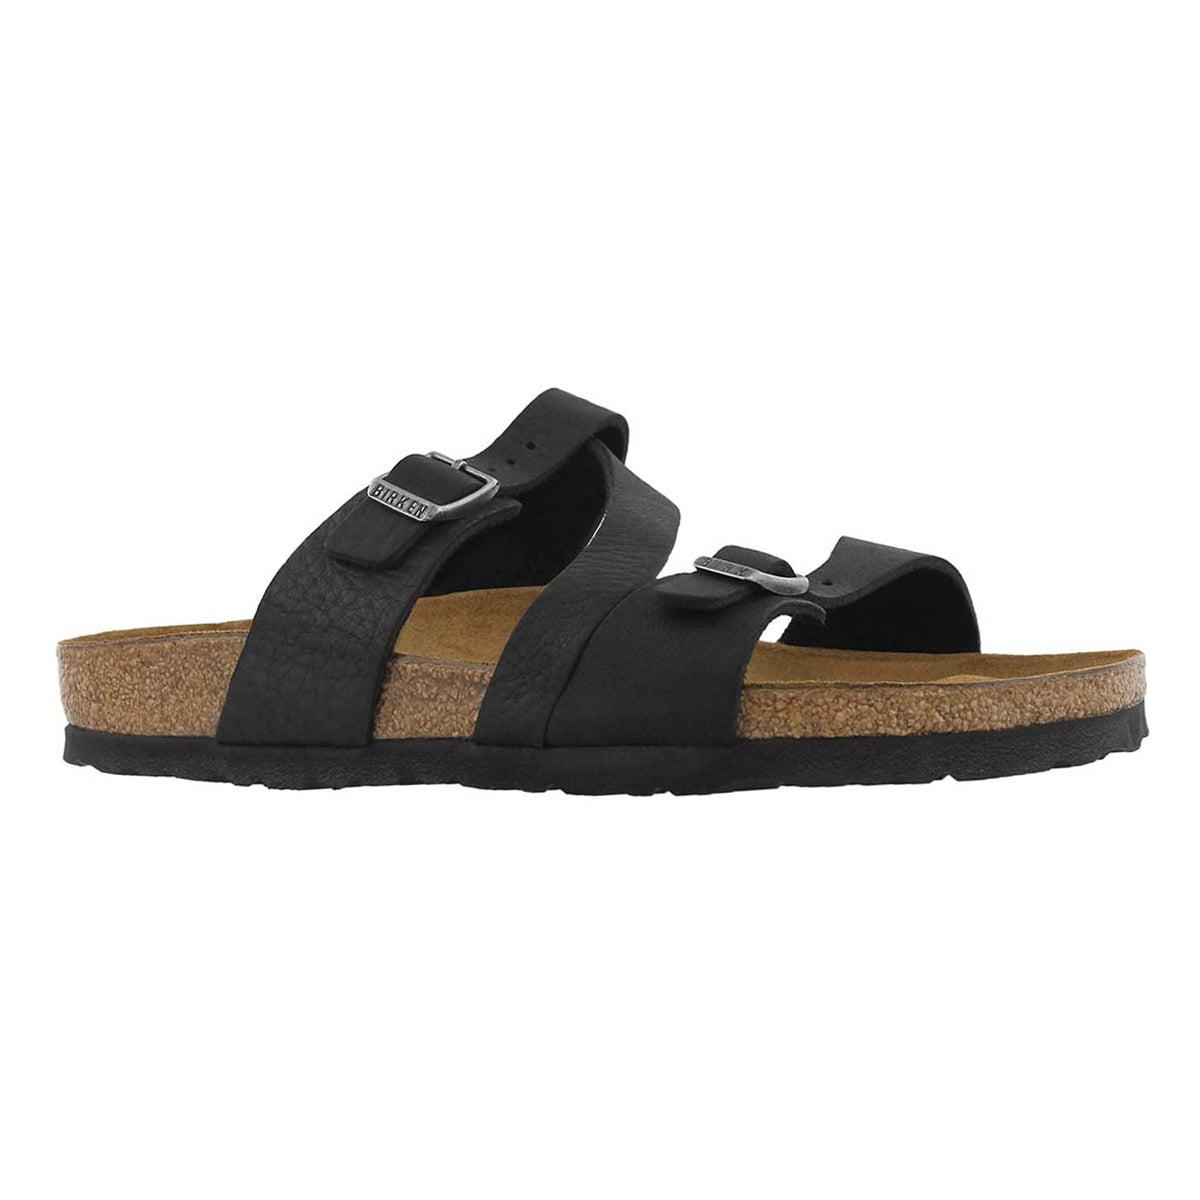 Women's SALINA CANBERRA black sandals - Narrow